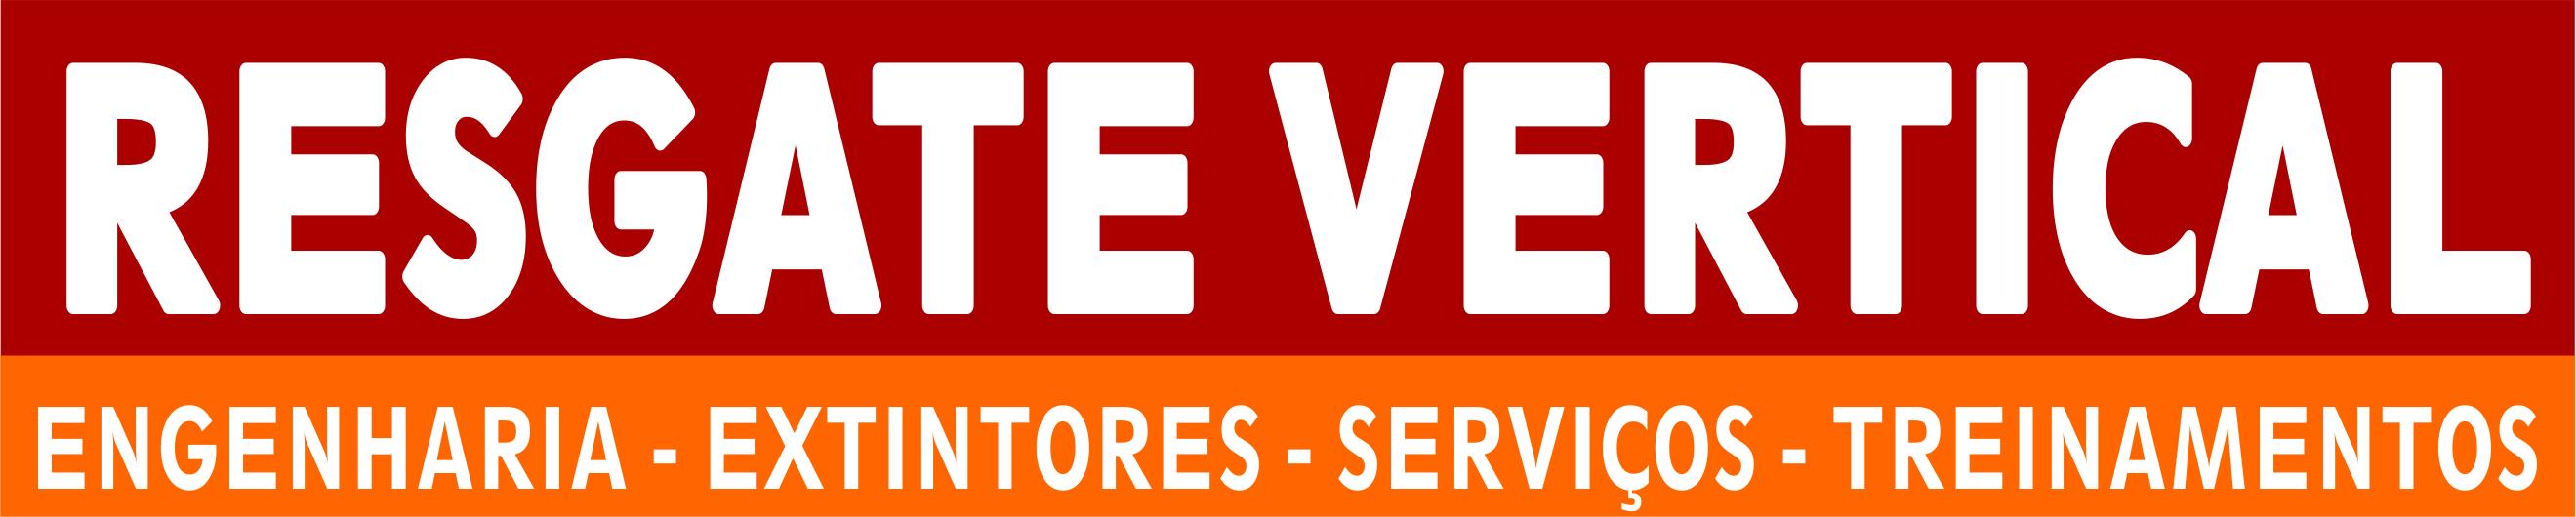 Logotipo Resgate Vertical